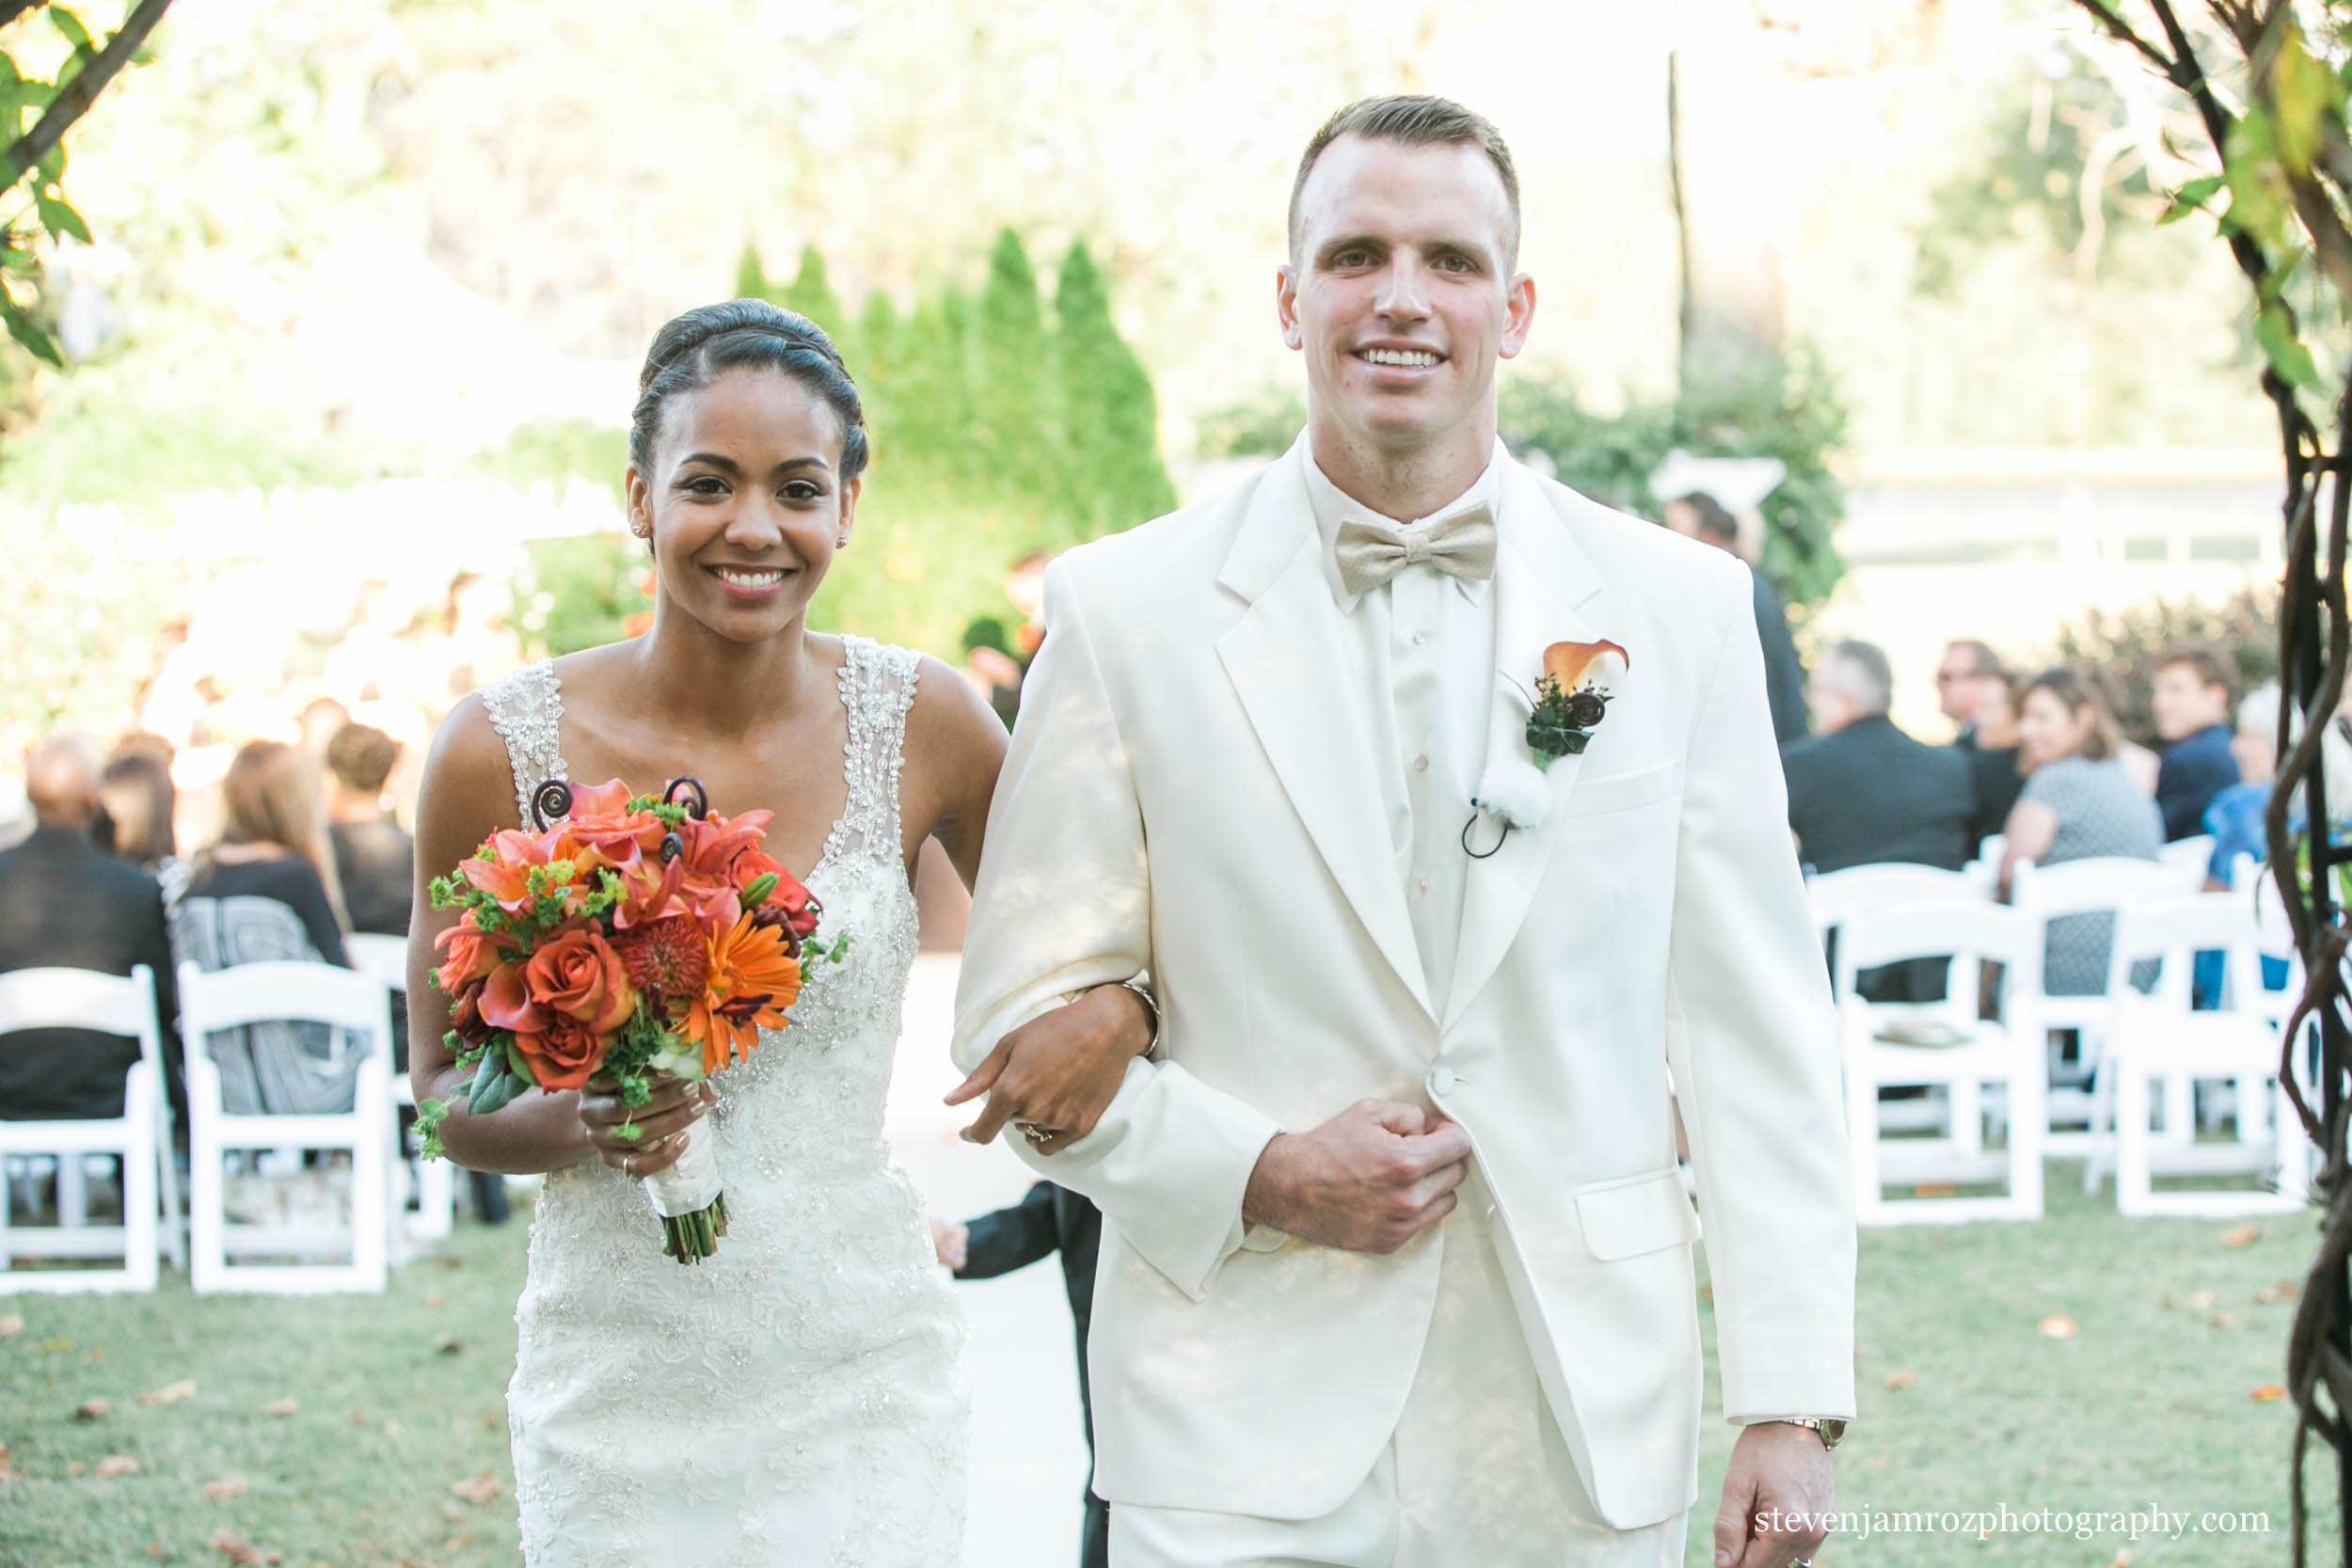 just-married-wedding-hudson-manor-gardens-steven-jamroz-photography-0183.jpg